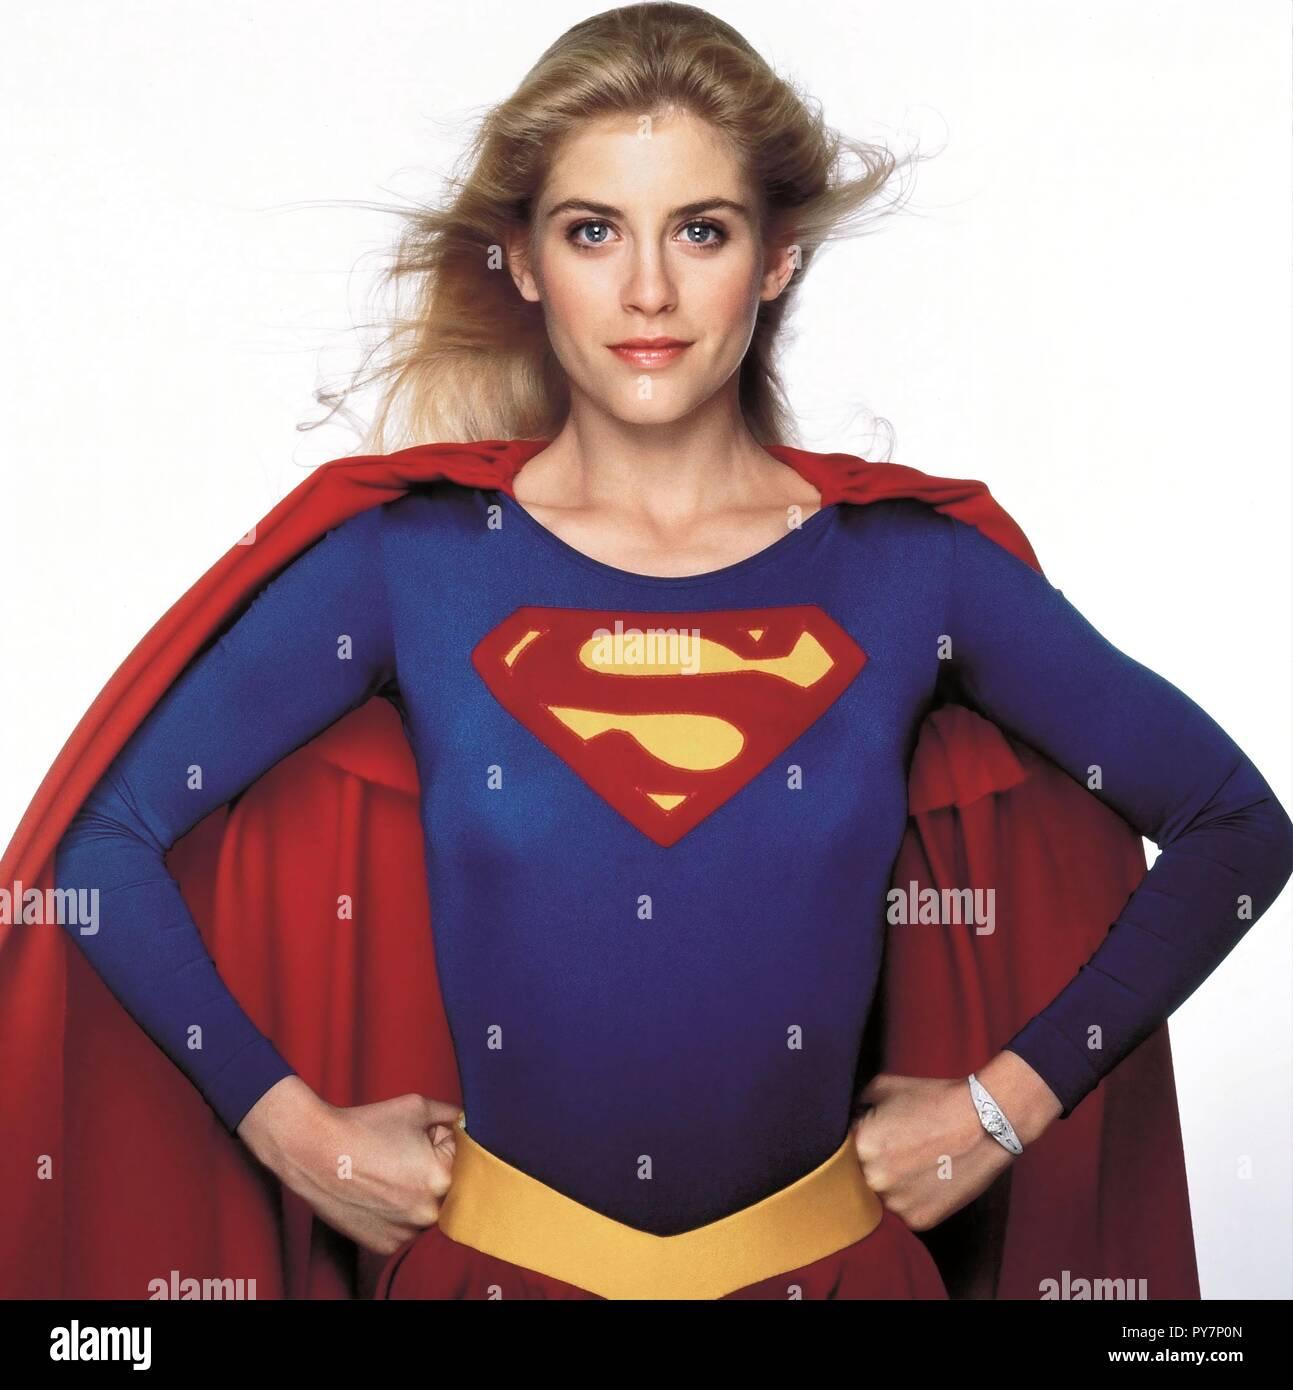 Superwoman - commission by mhunt on DeviantArt   Original Superwoman